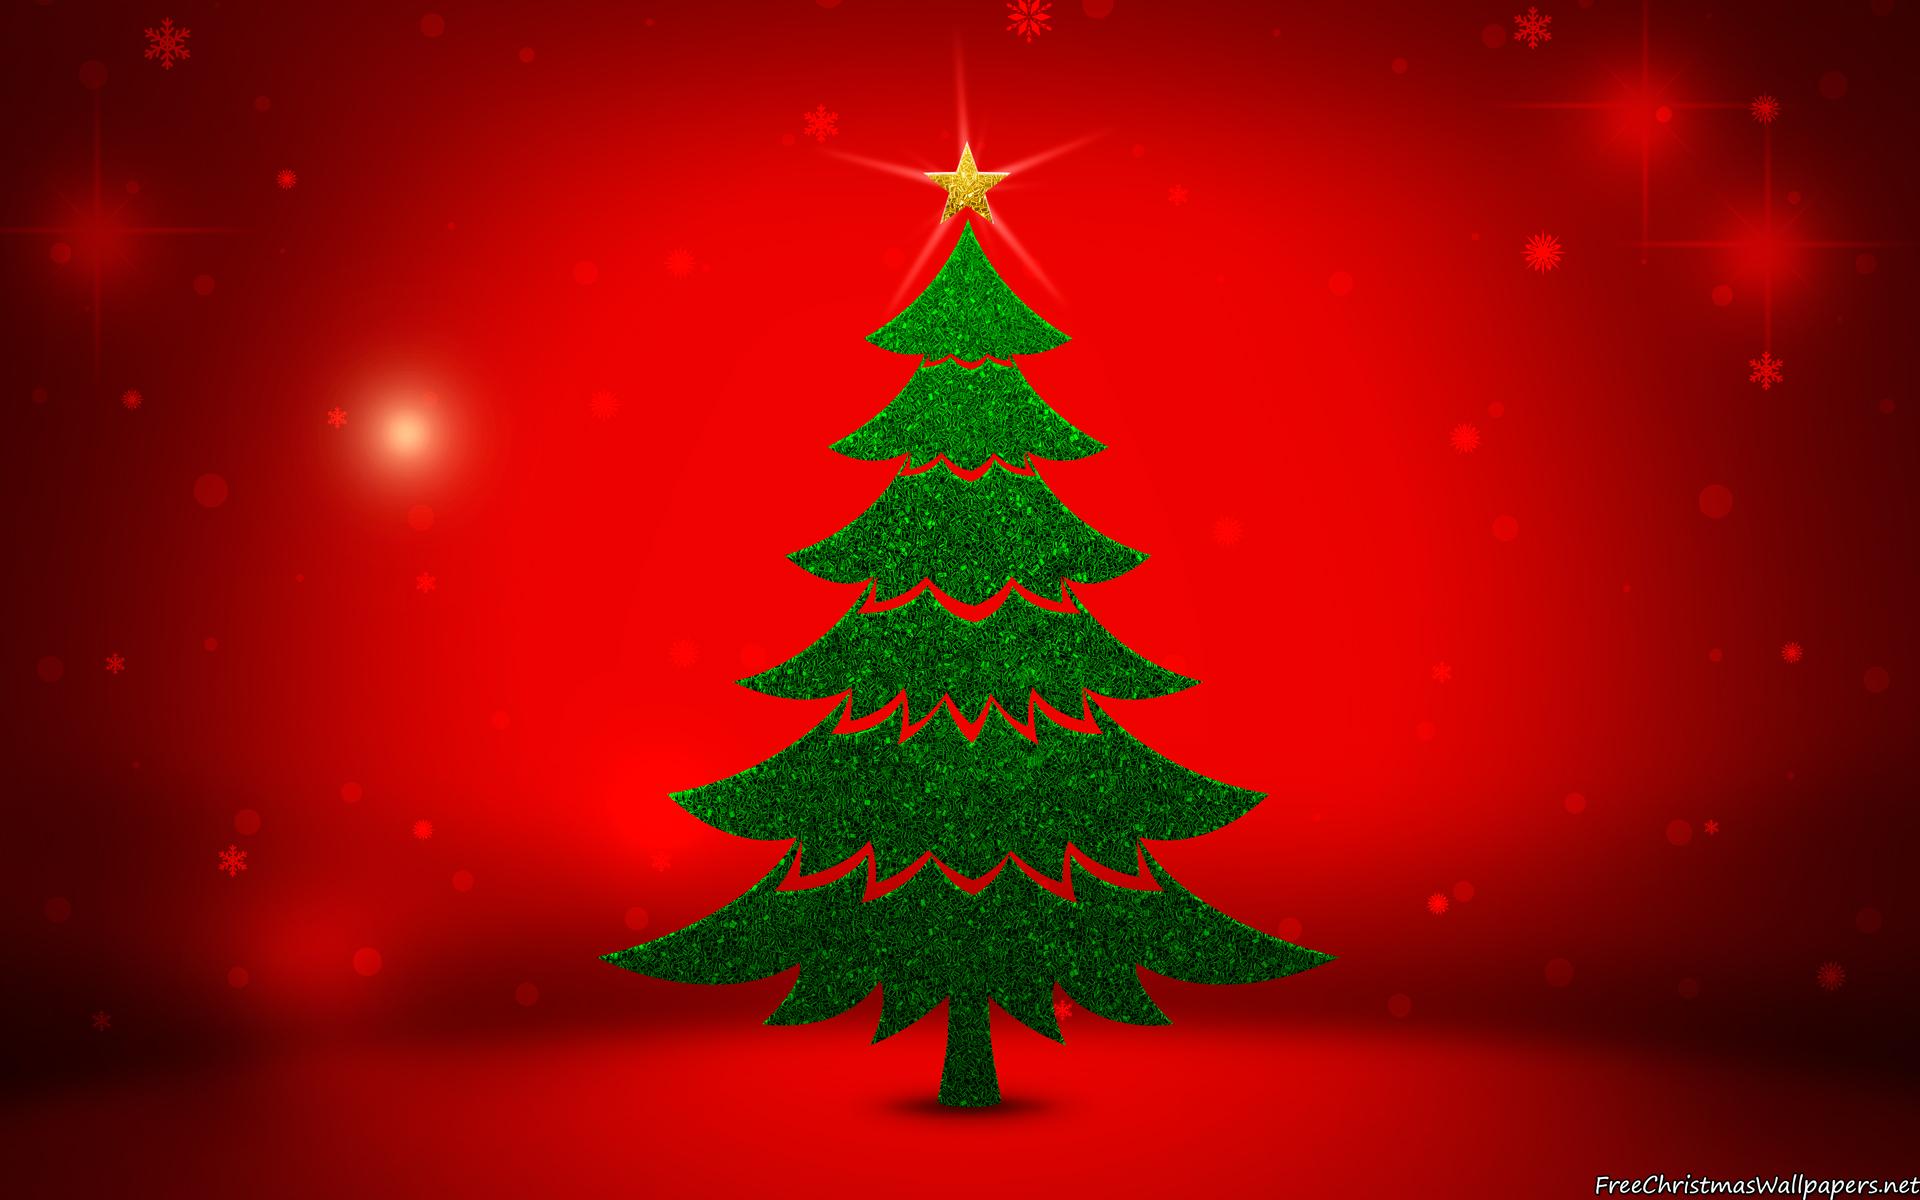 Download Christmas Tree Background 1024x768 | 1366x768 | 1920x1080 | 1920x1200